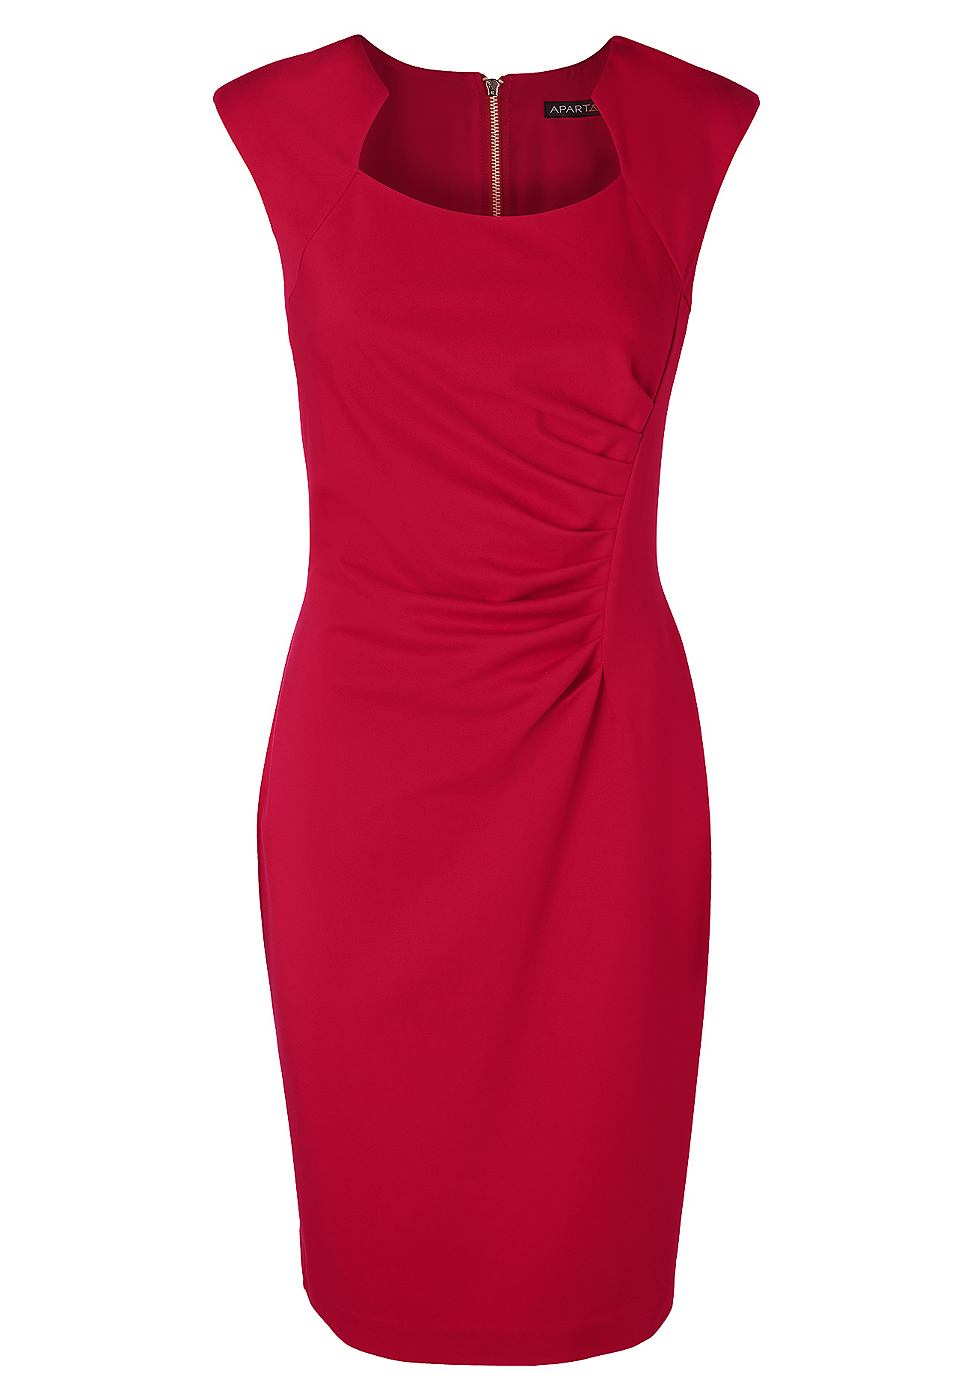 Apart Tricot jurk rood